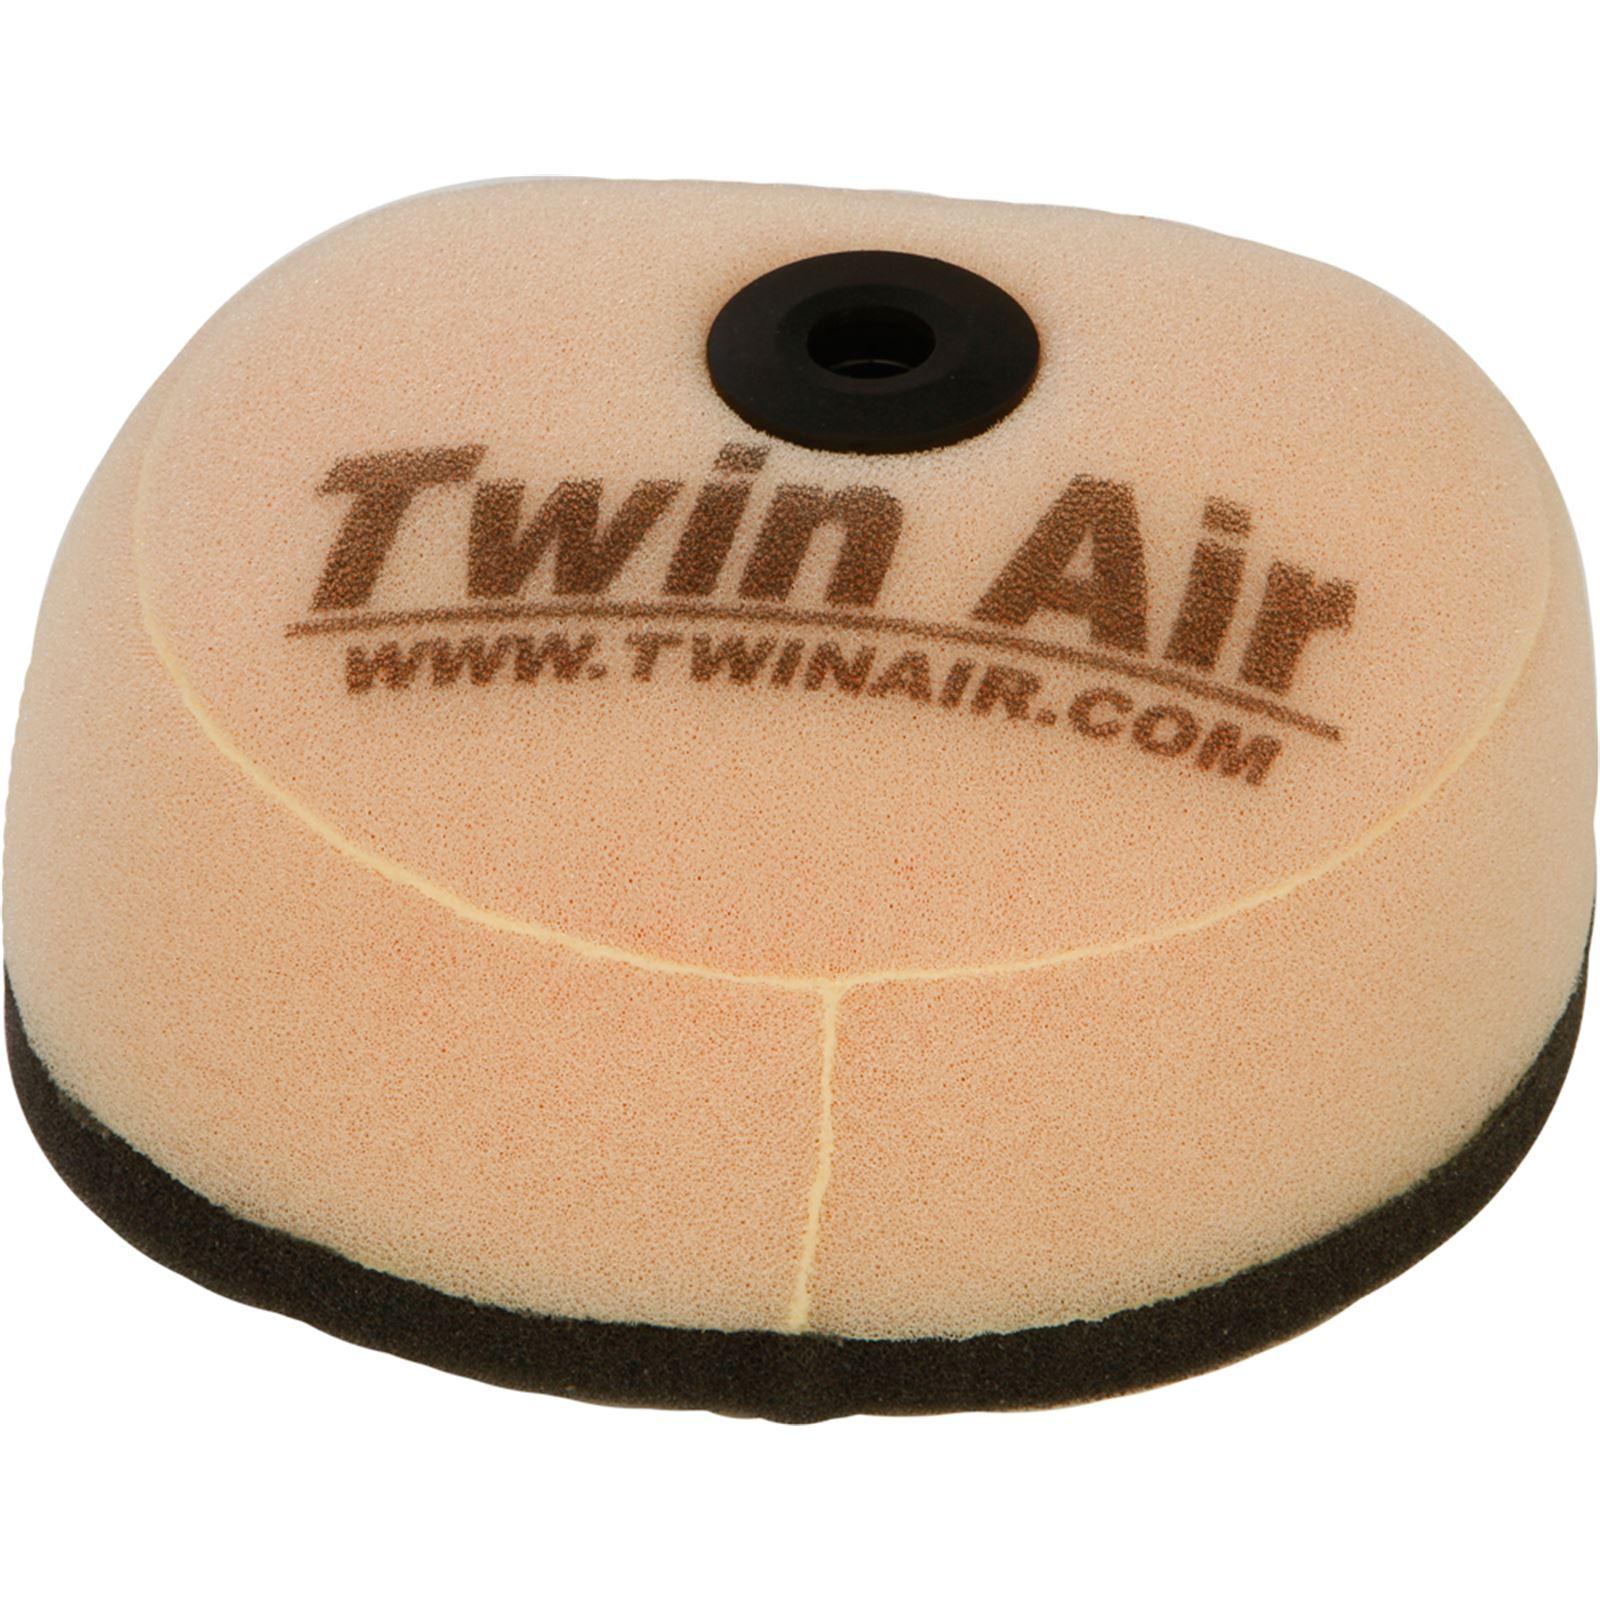 Twin Air Power Flow Filter